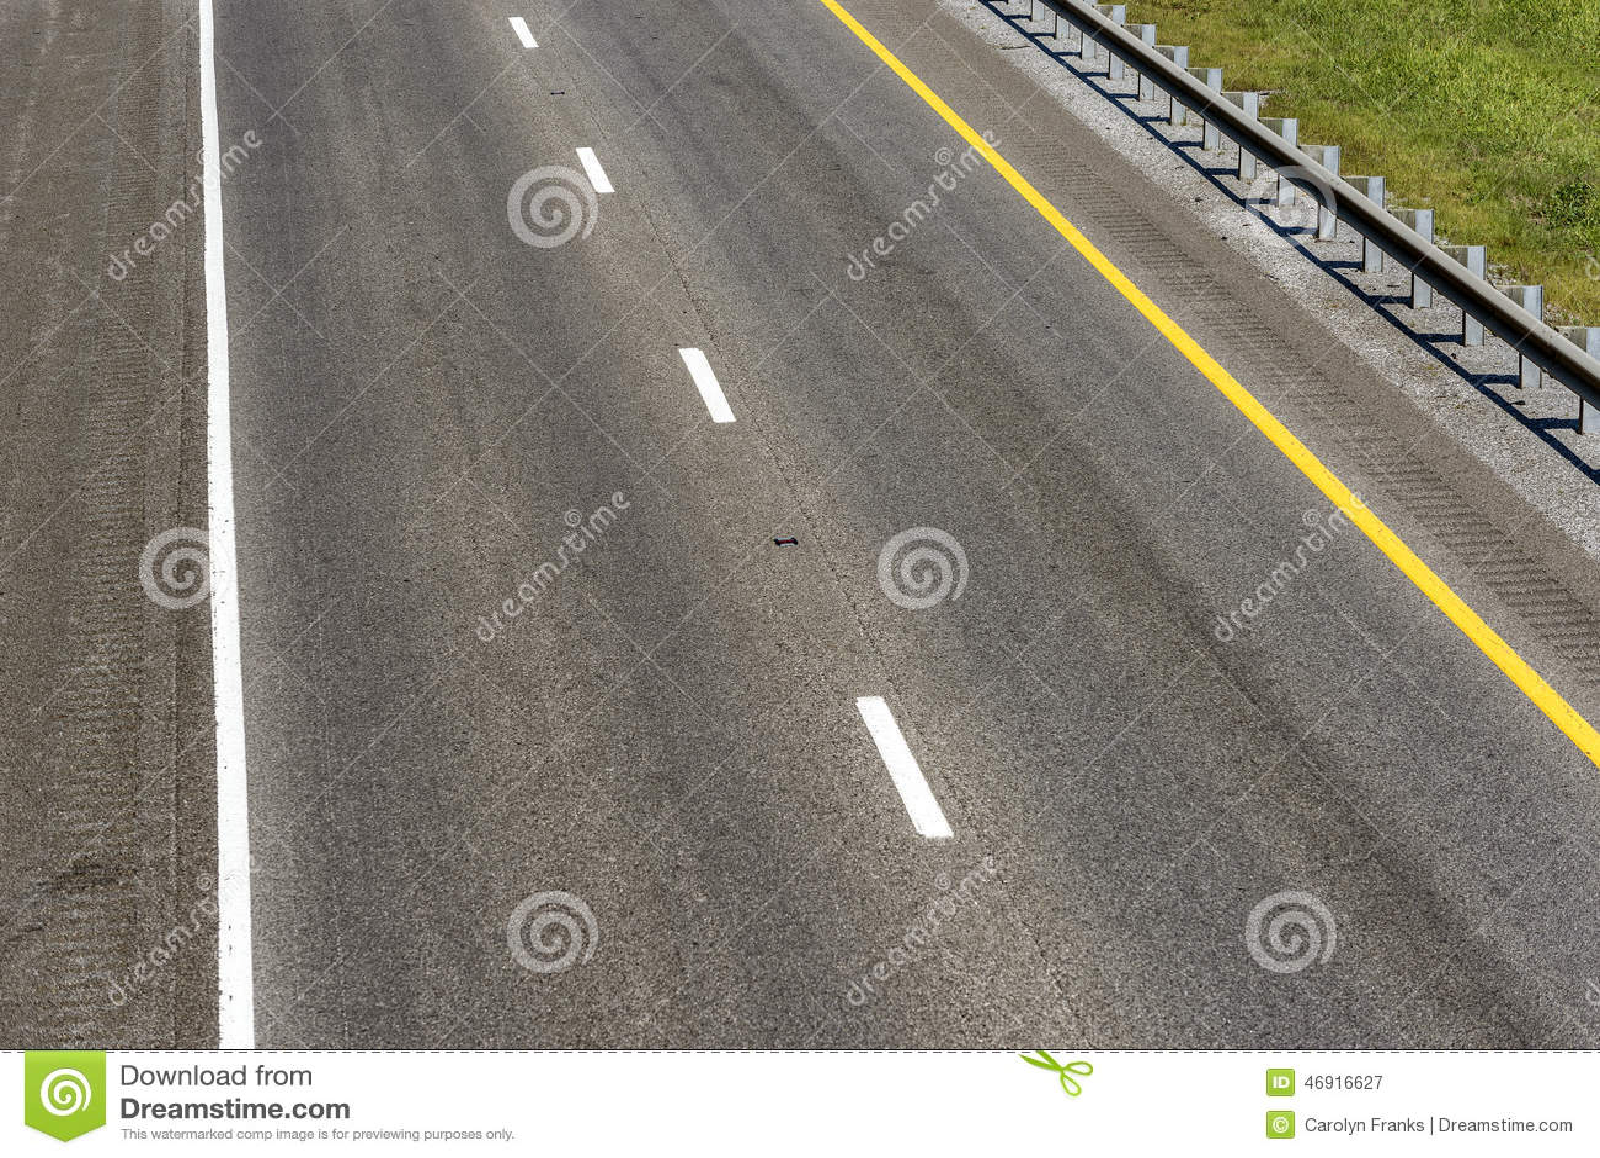 Empty Interstate Highway Copy Space